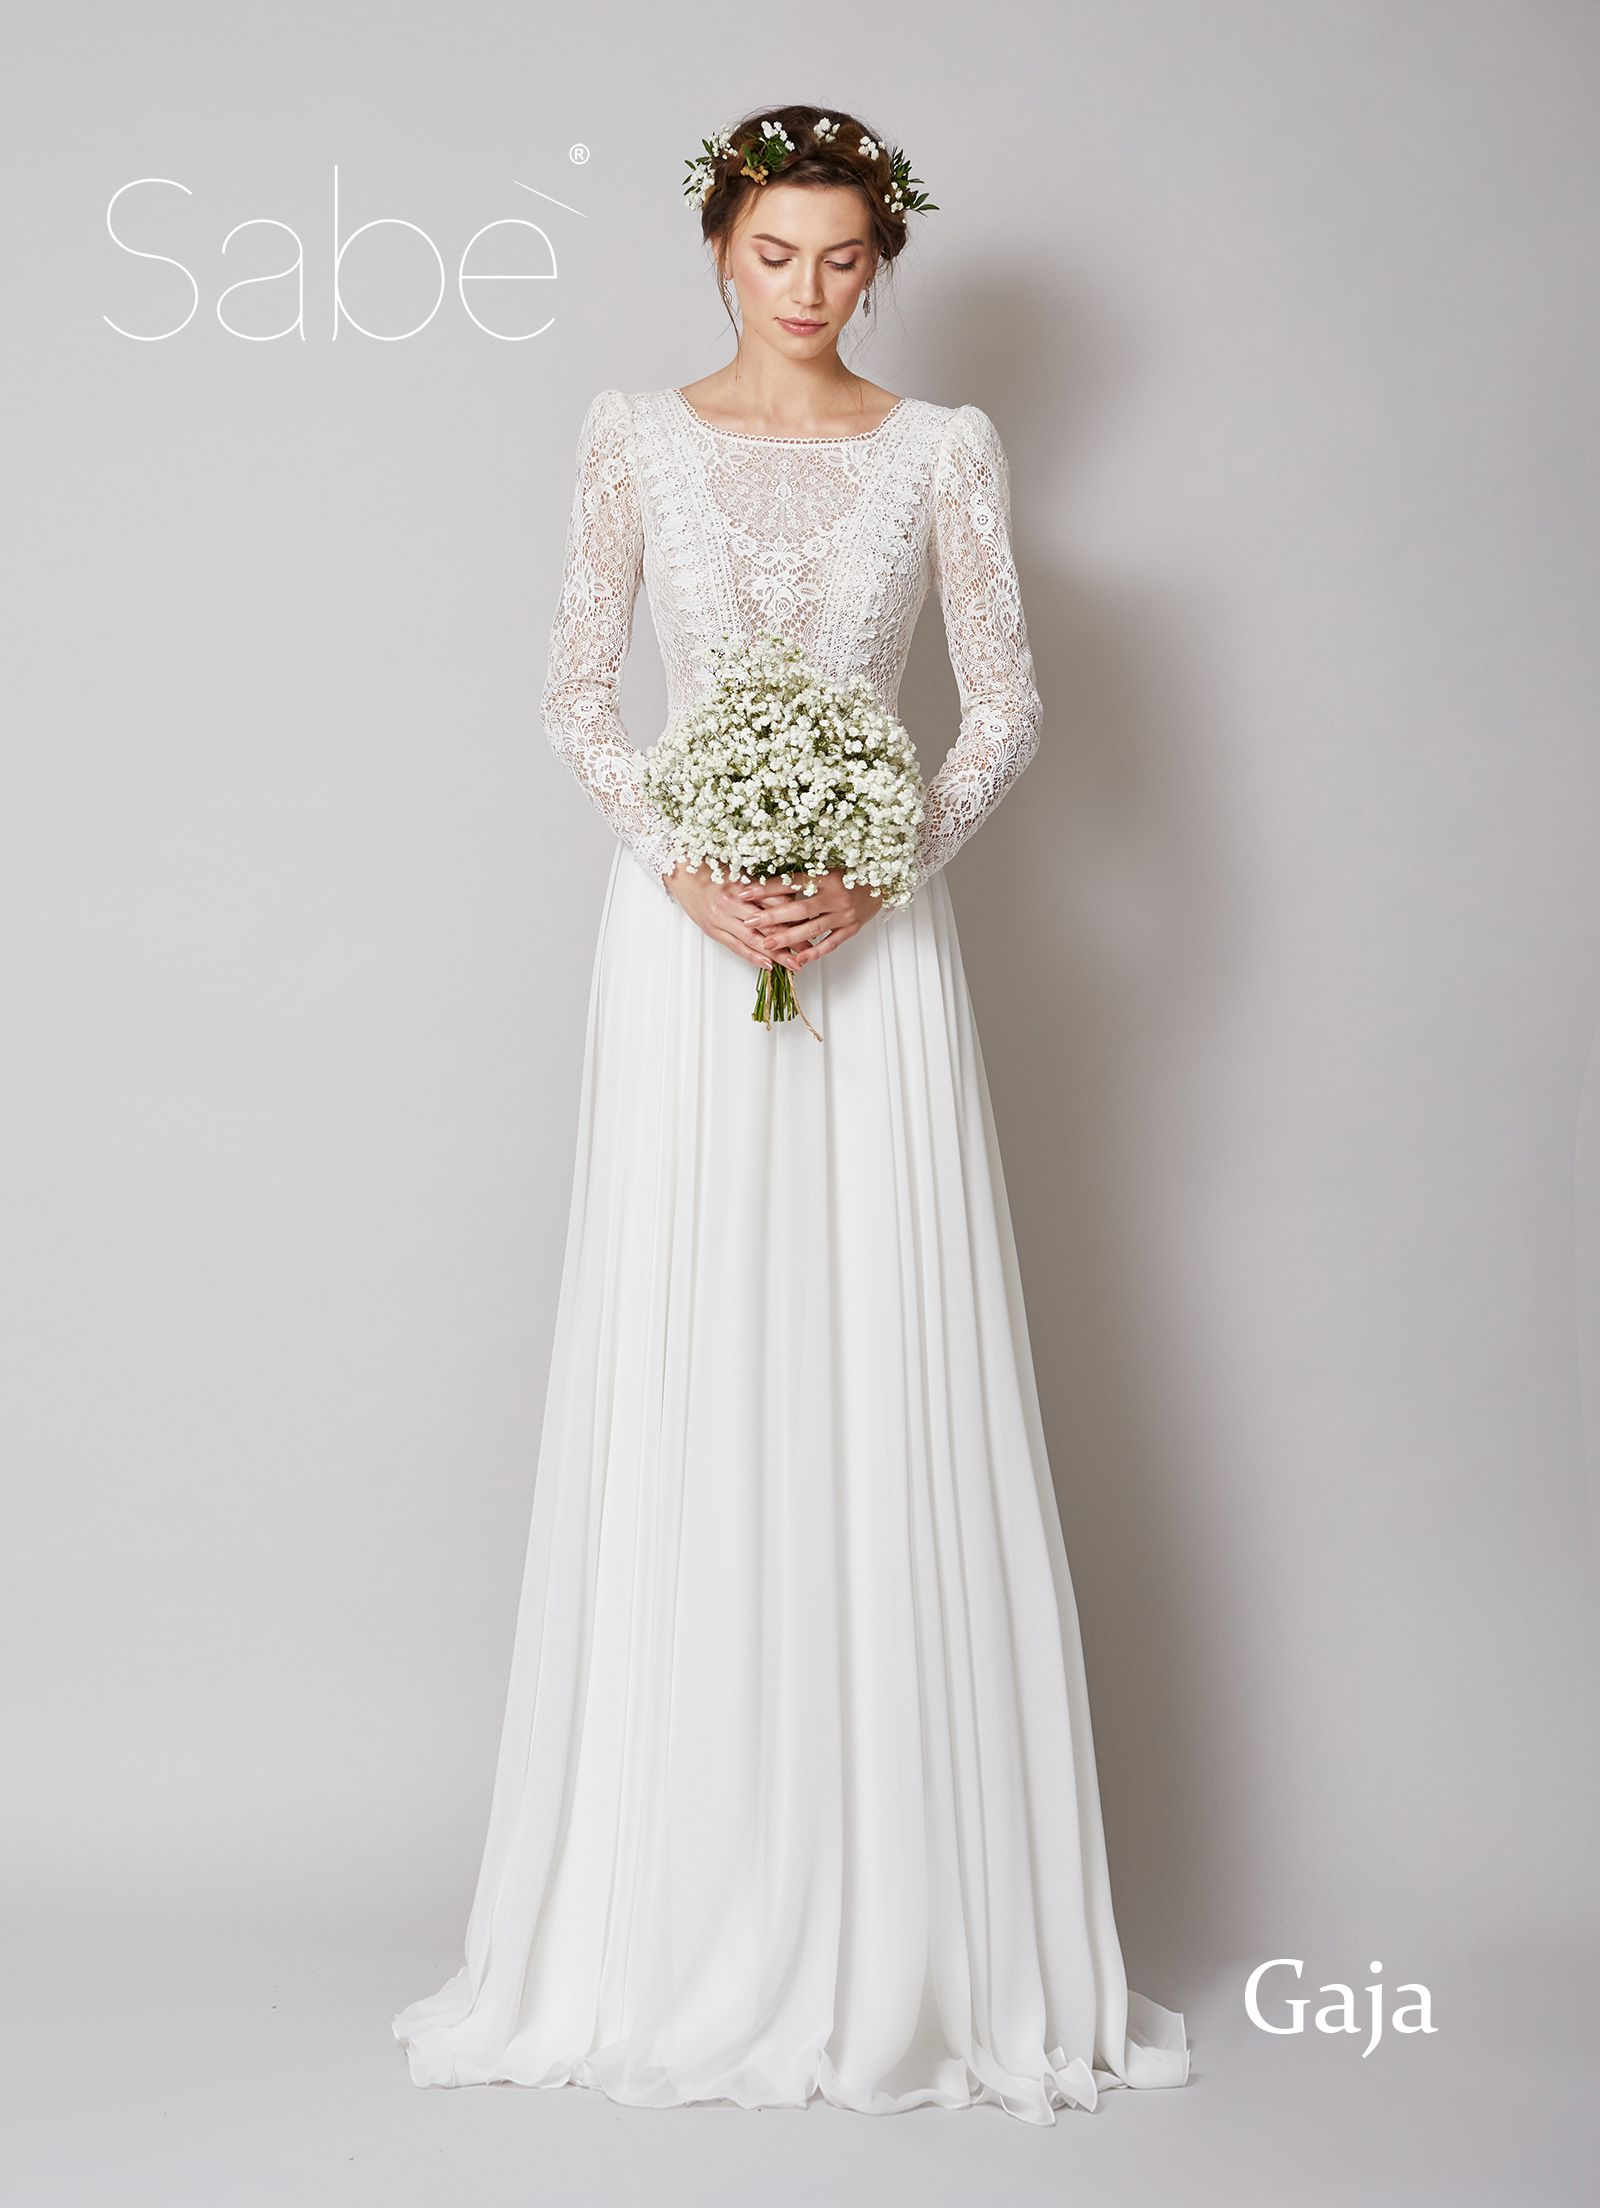 Delicate Wedding Dress Beautiful Wedding Dress Romantic Wedding Dress Stunning Wedding Dress Boho Wedding Dress Long Sleeve Wedding Dresses Bridal Dresses [ 2208 x 1600 Pixel ]